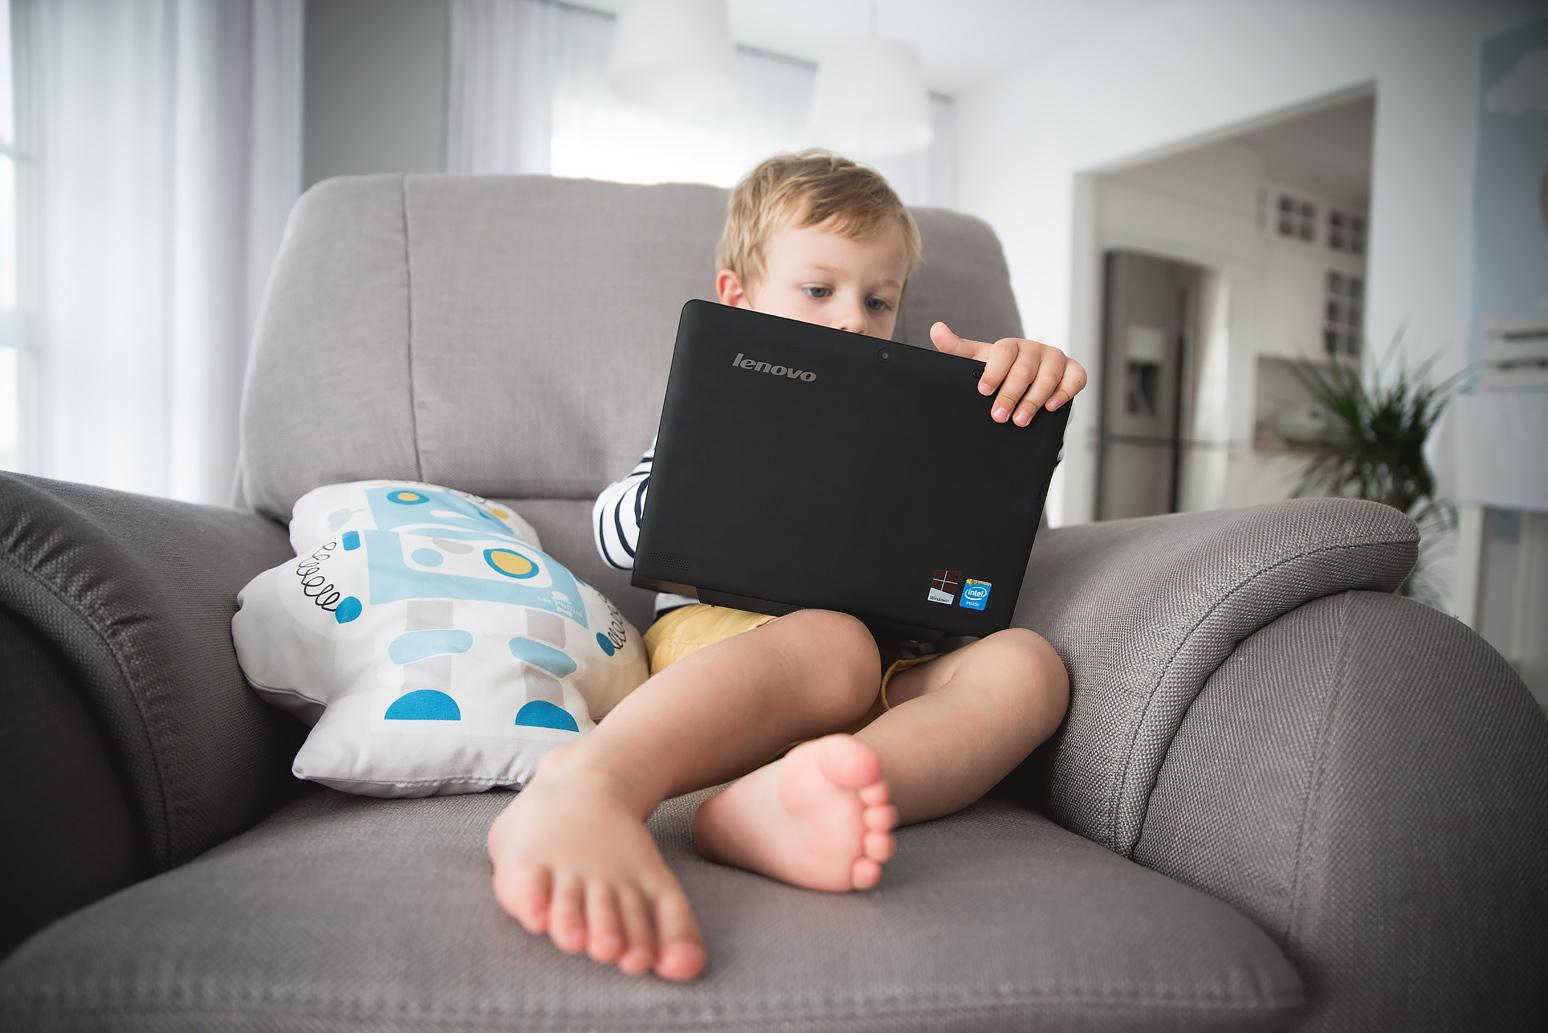 komputerek dla dziecka